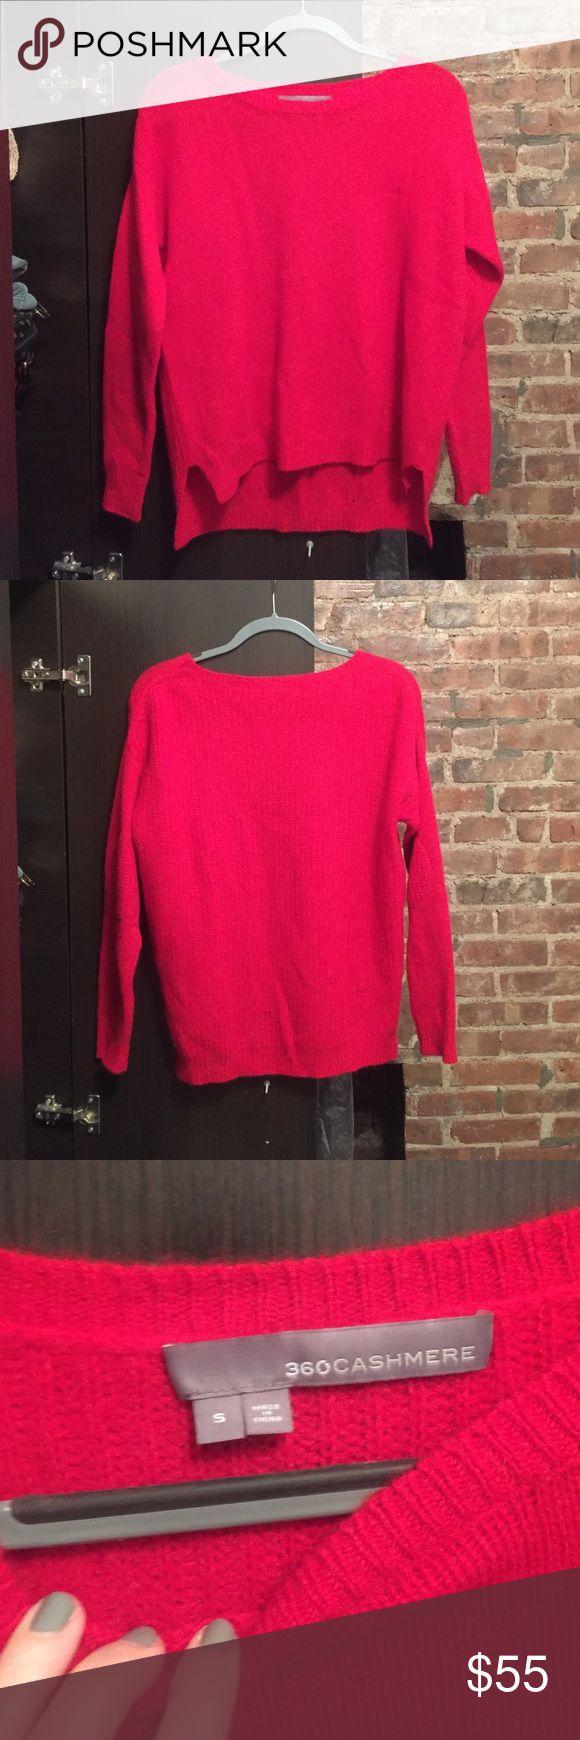 360 cashmere sweater True red sweater, like new. Subtle elbow patches. 100% cashmere 360 Cashmere Sweaters Crew & Scoop Necks